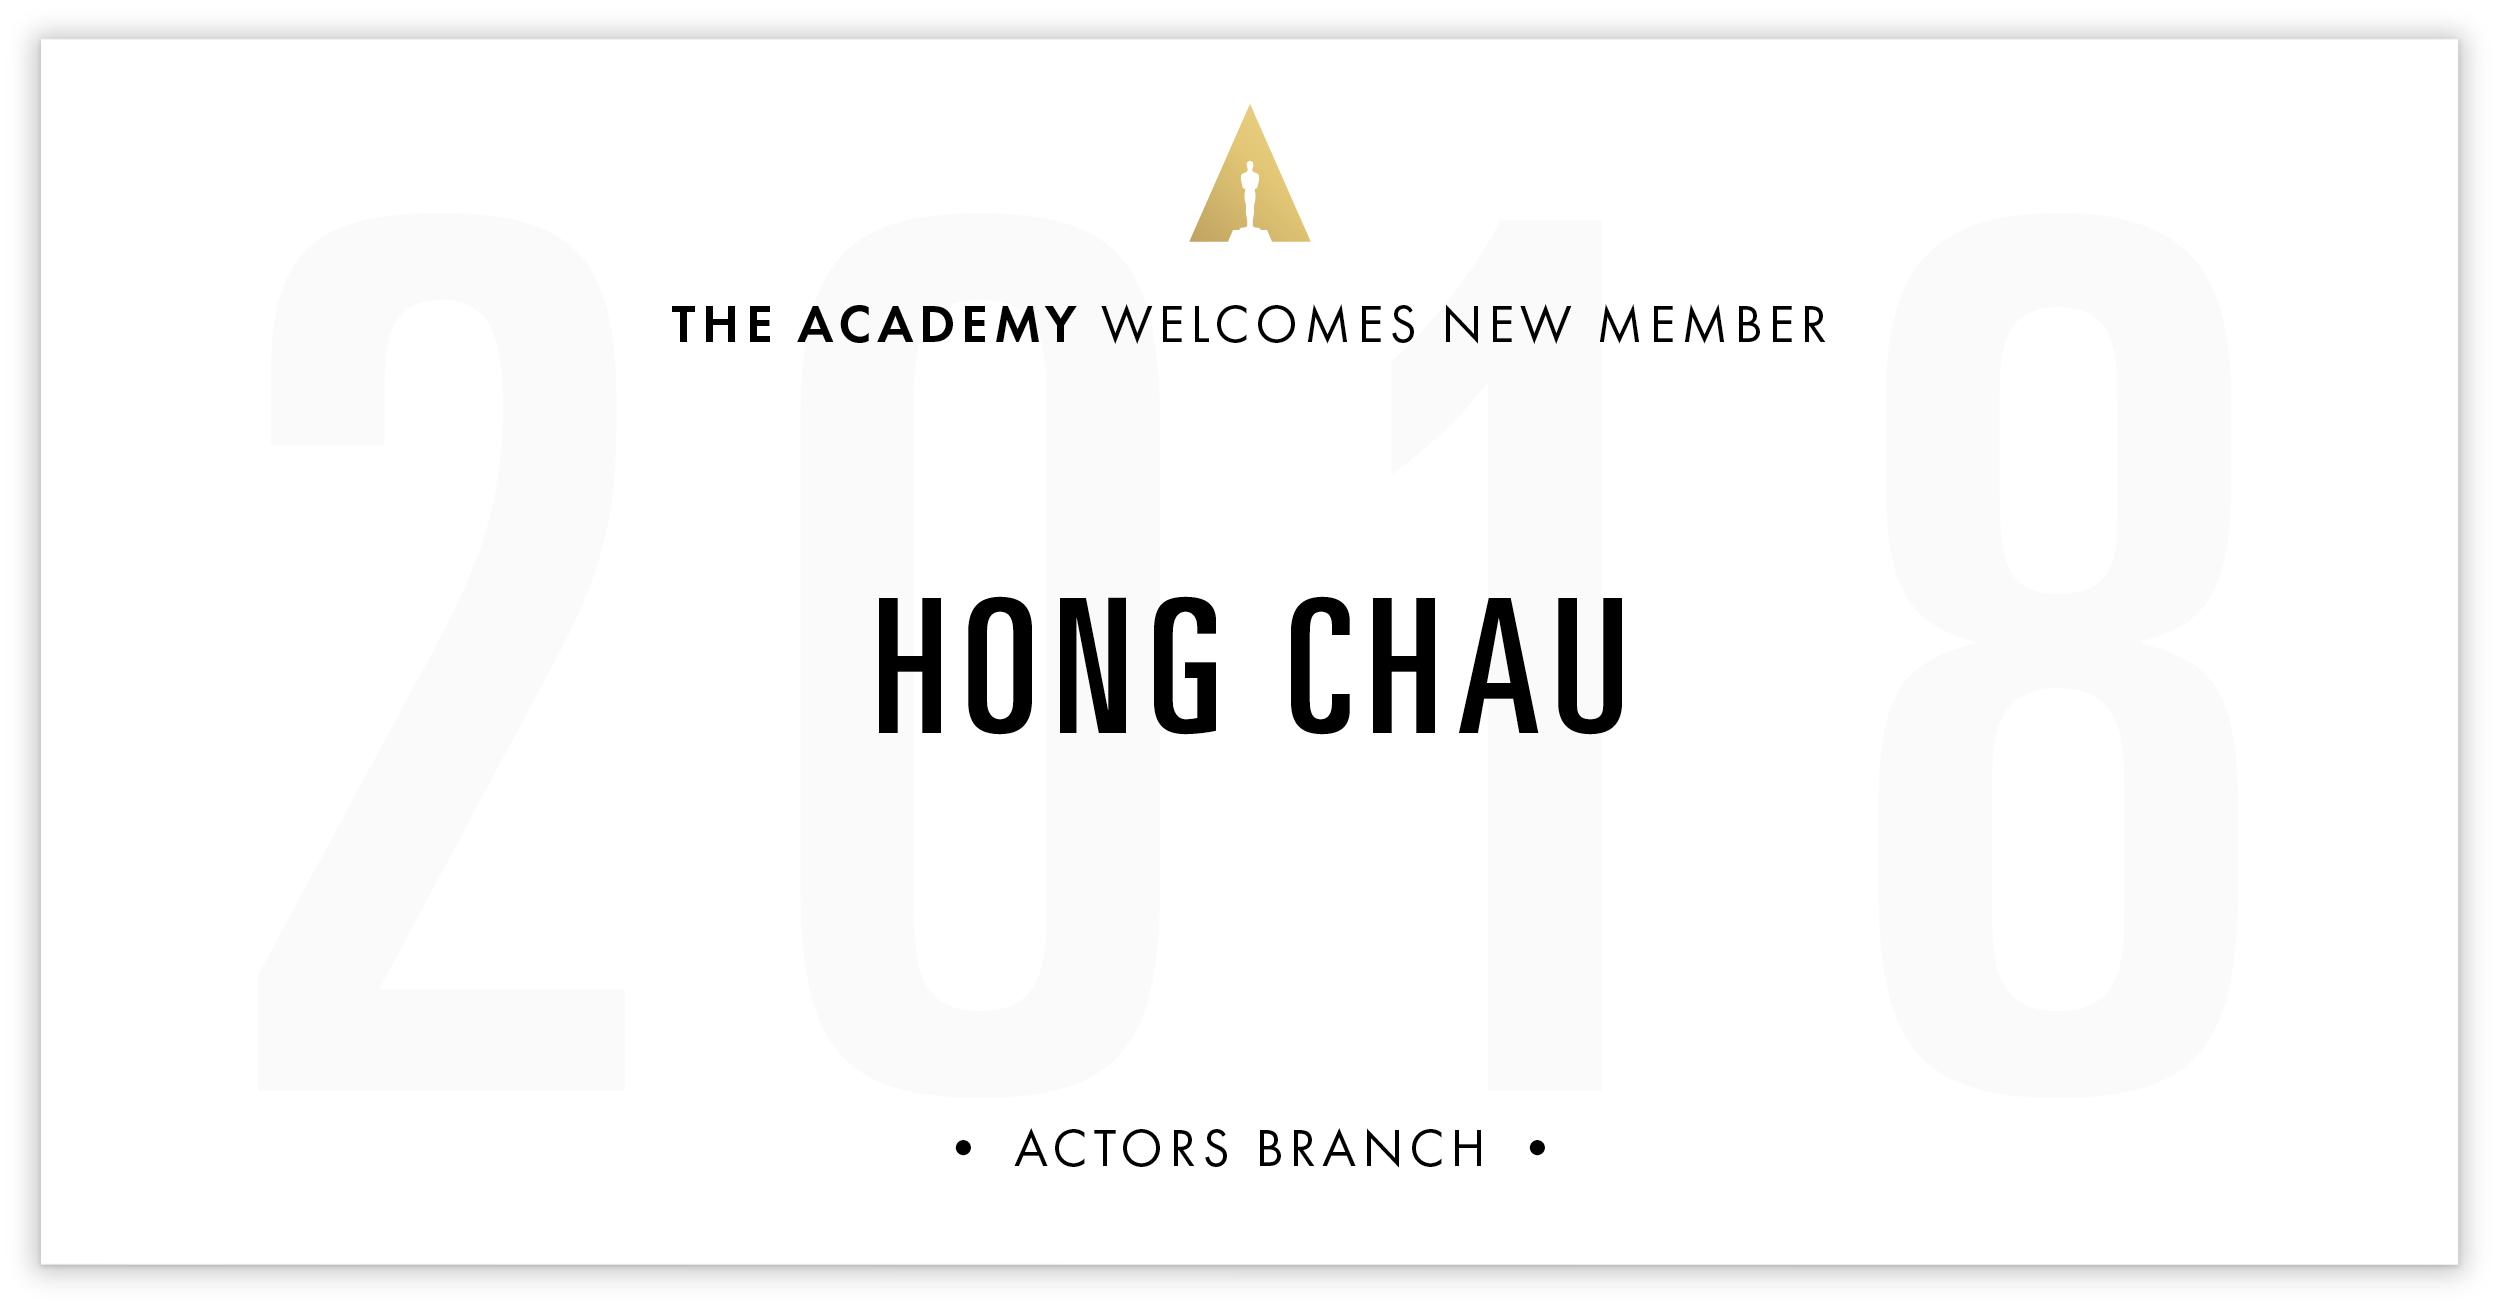 Hong Chau is invited!